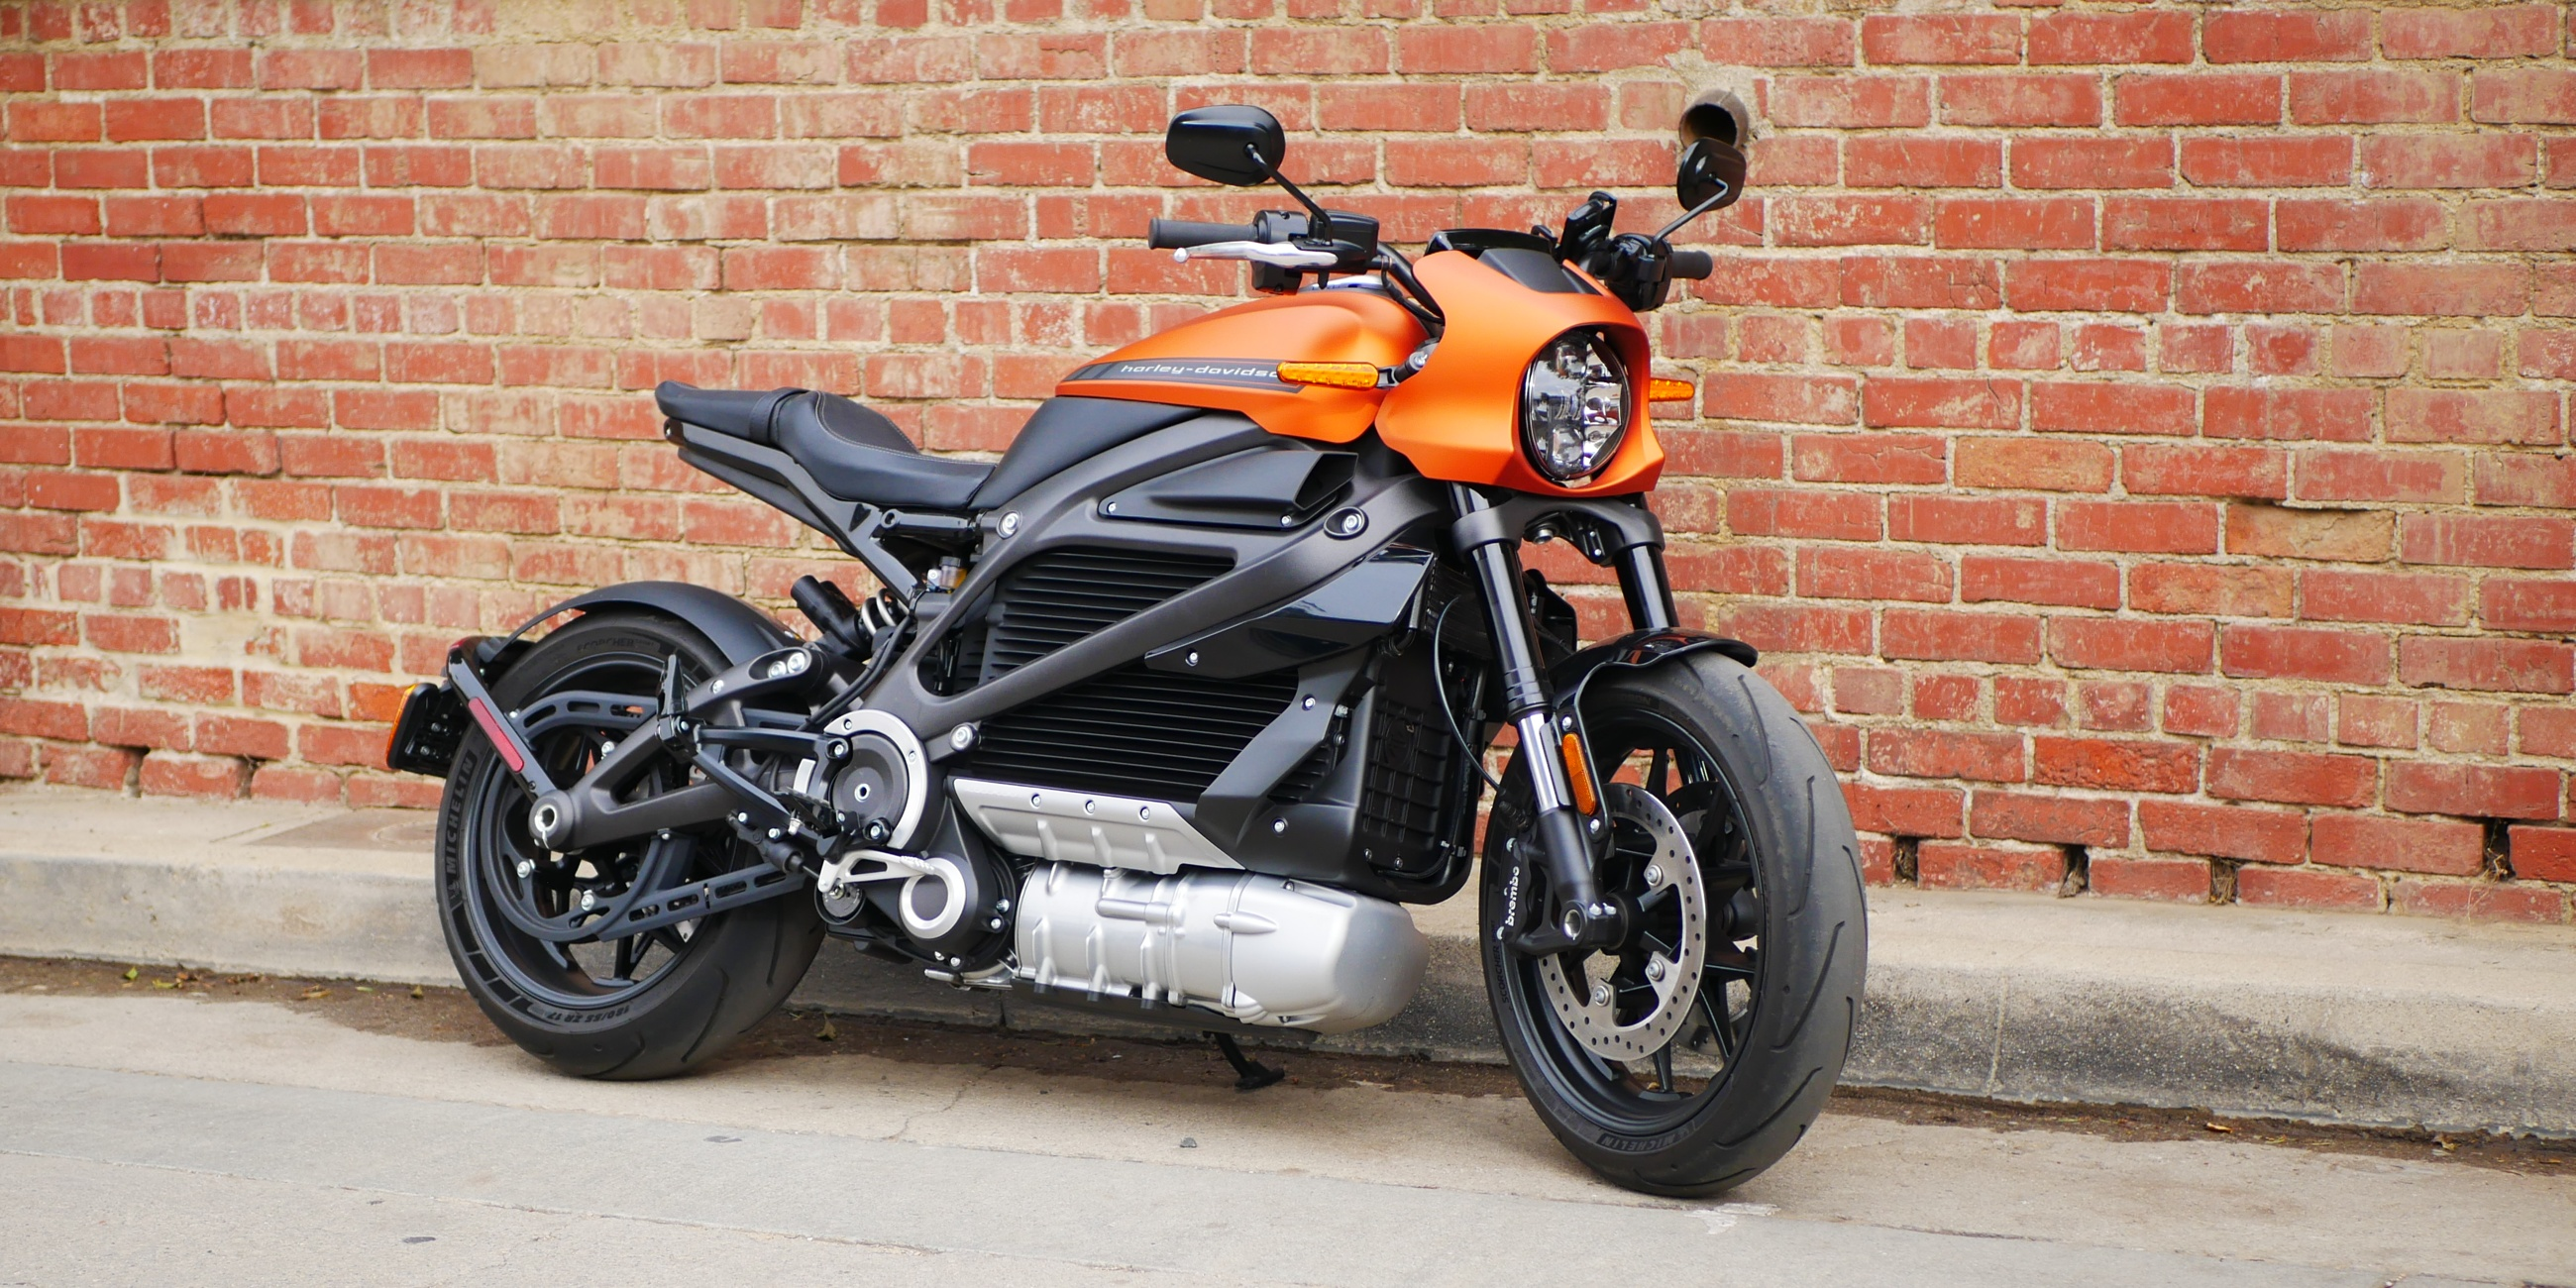 TASWK 1 Round Motorcycle Brake Tail Light for Harley Honda Yamaha Suzuki Kawasaki Tail Lights